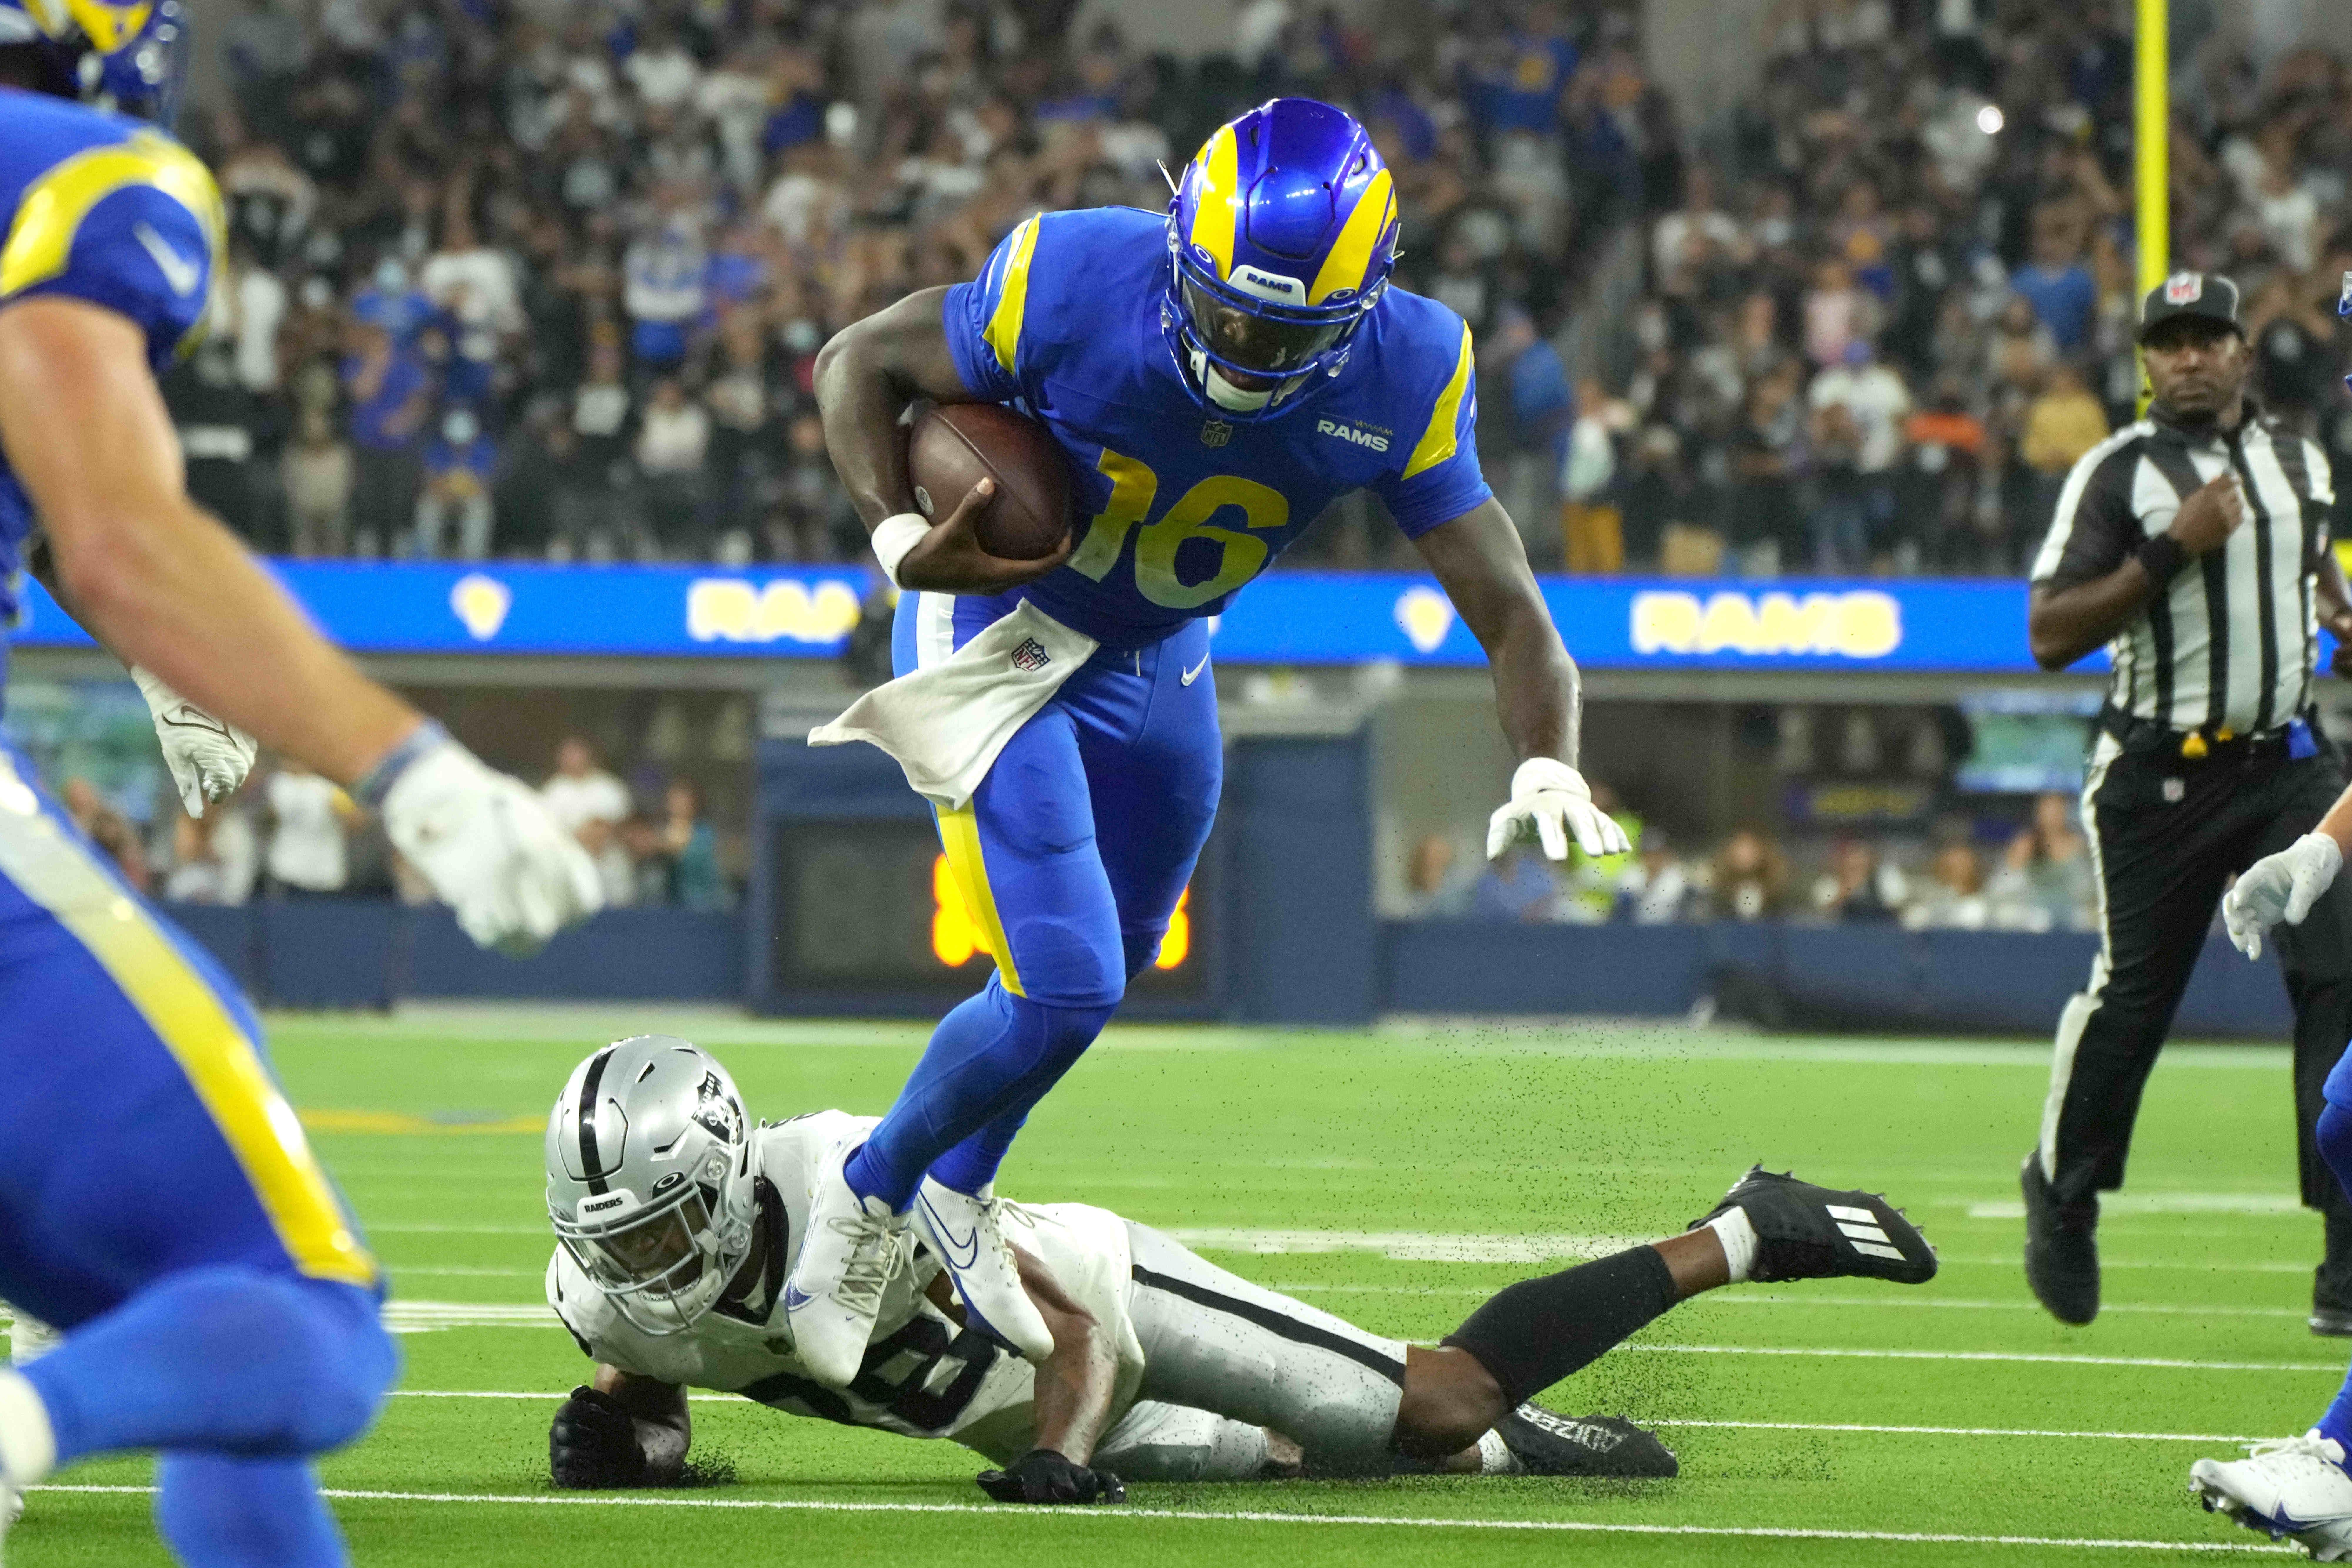 Los Angeles Rams quarterback Bryce Perkins (16) runs the ball against Las Vegas Raiders cornerback Rasul Douglas (38) in the fourth quarter at SoFi Stadium